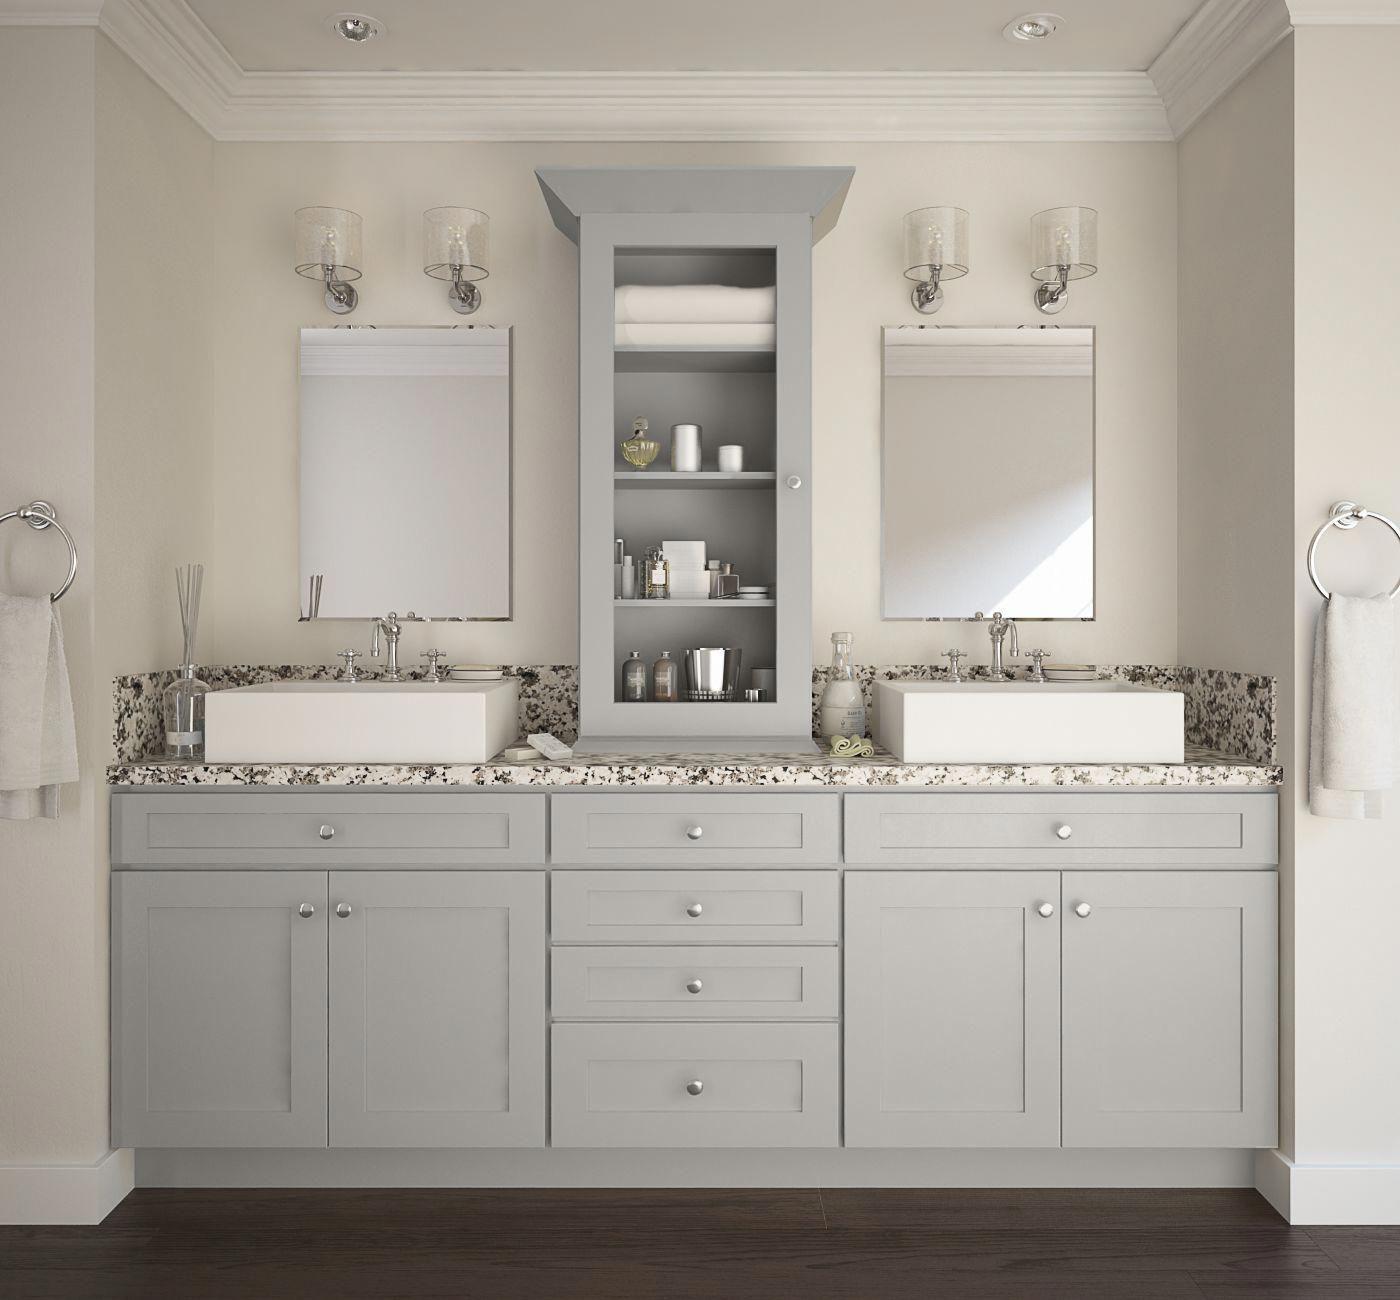 Gray Bathroom Vanities Society Shaker Dove Gray Bathroom Grey Bathroom Cabinets Bathroom Sink Vanity Bathroom Vanity